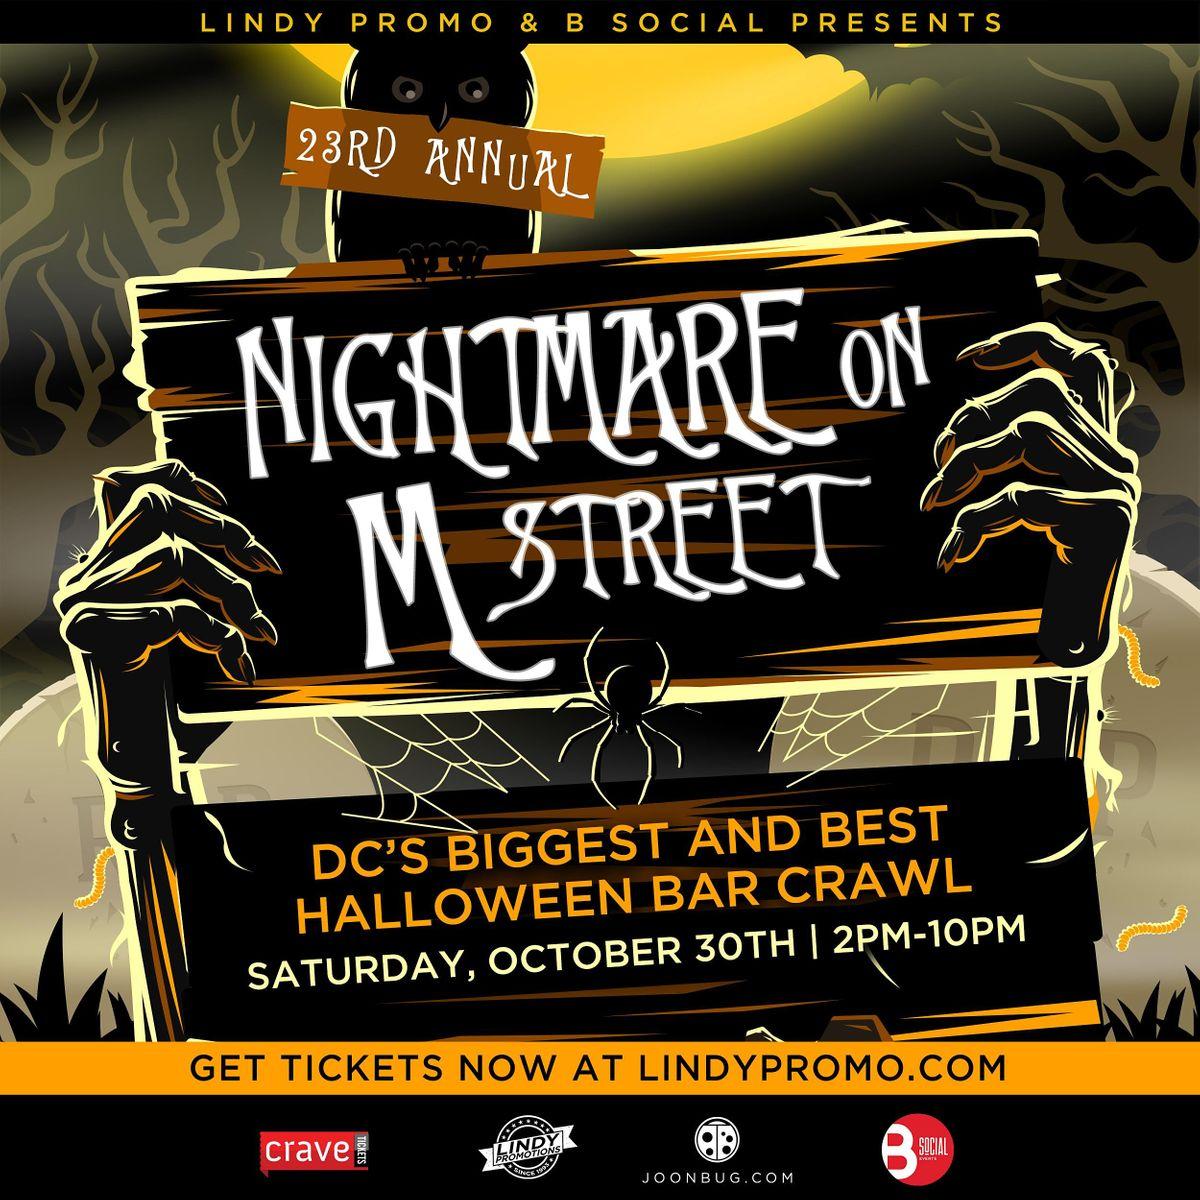 23rd Annual Nightmare On M Street Bar Crawl